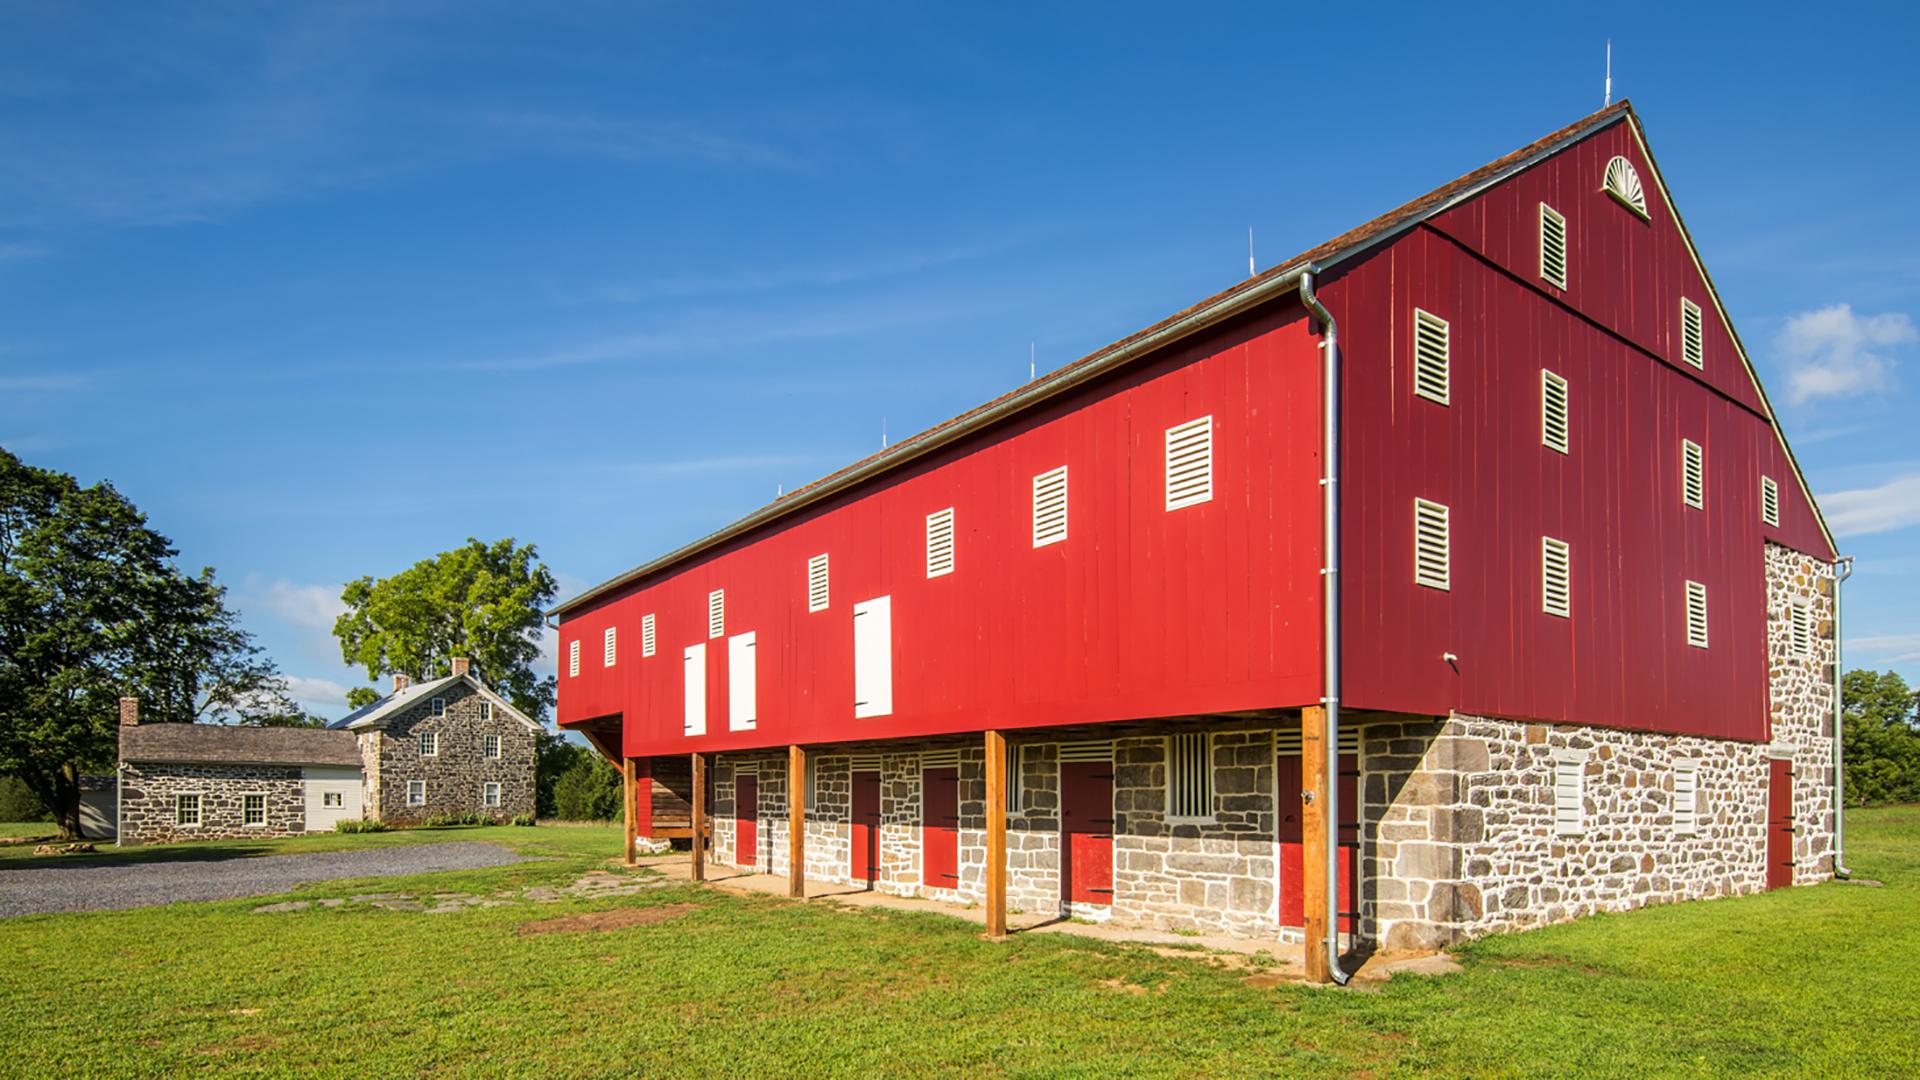 George Spangler Farmstead at Gettysburg Foundation